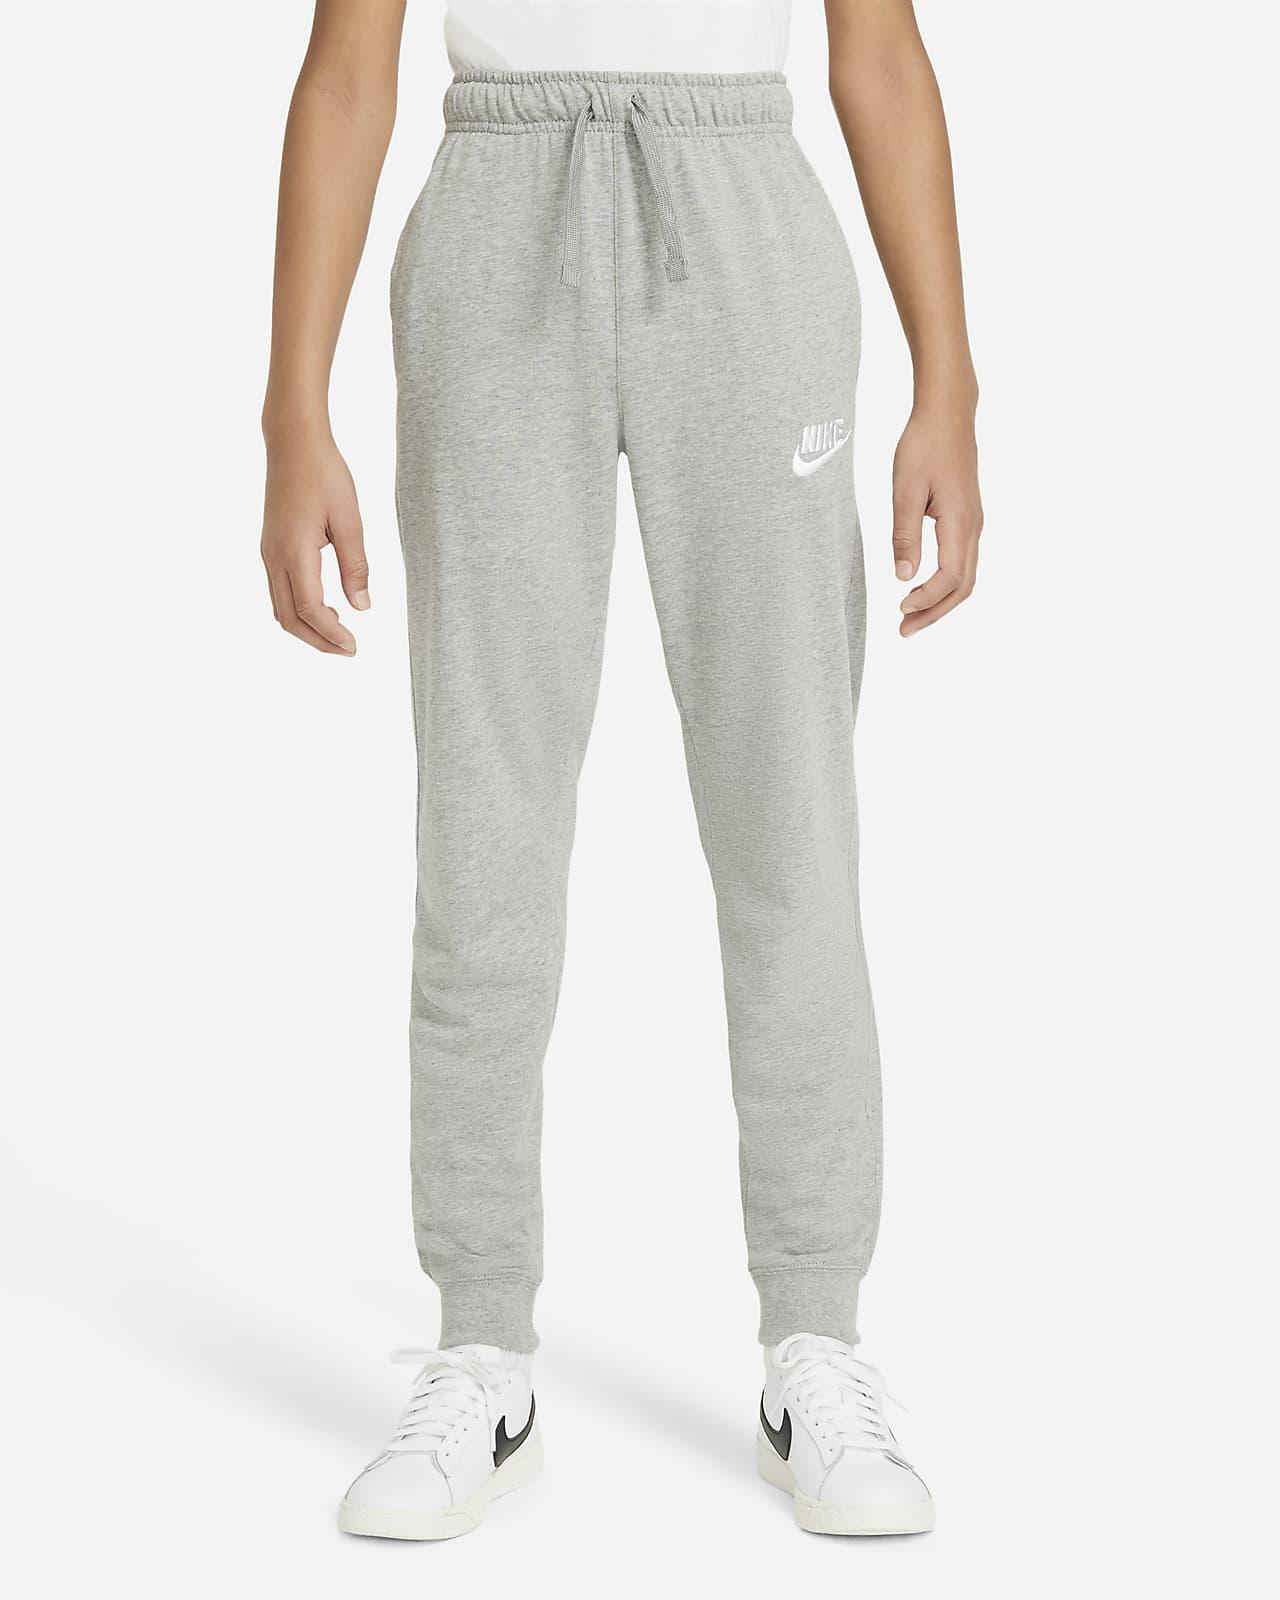 Nike Sportswear Big Kids' (Boys') Pants